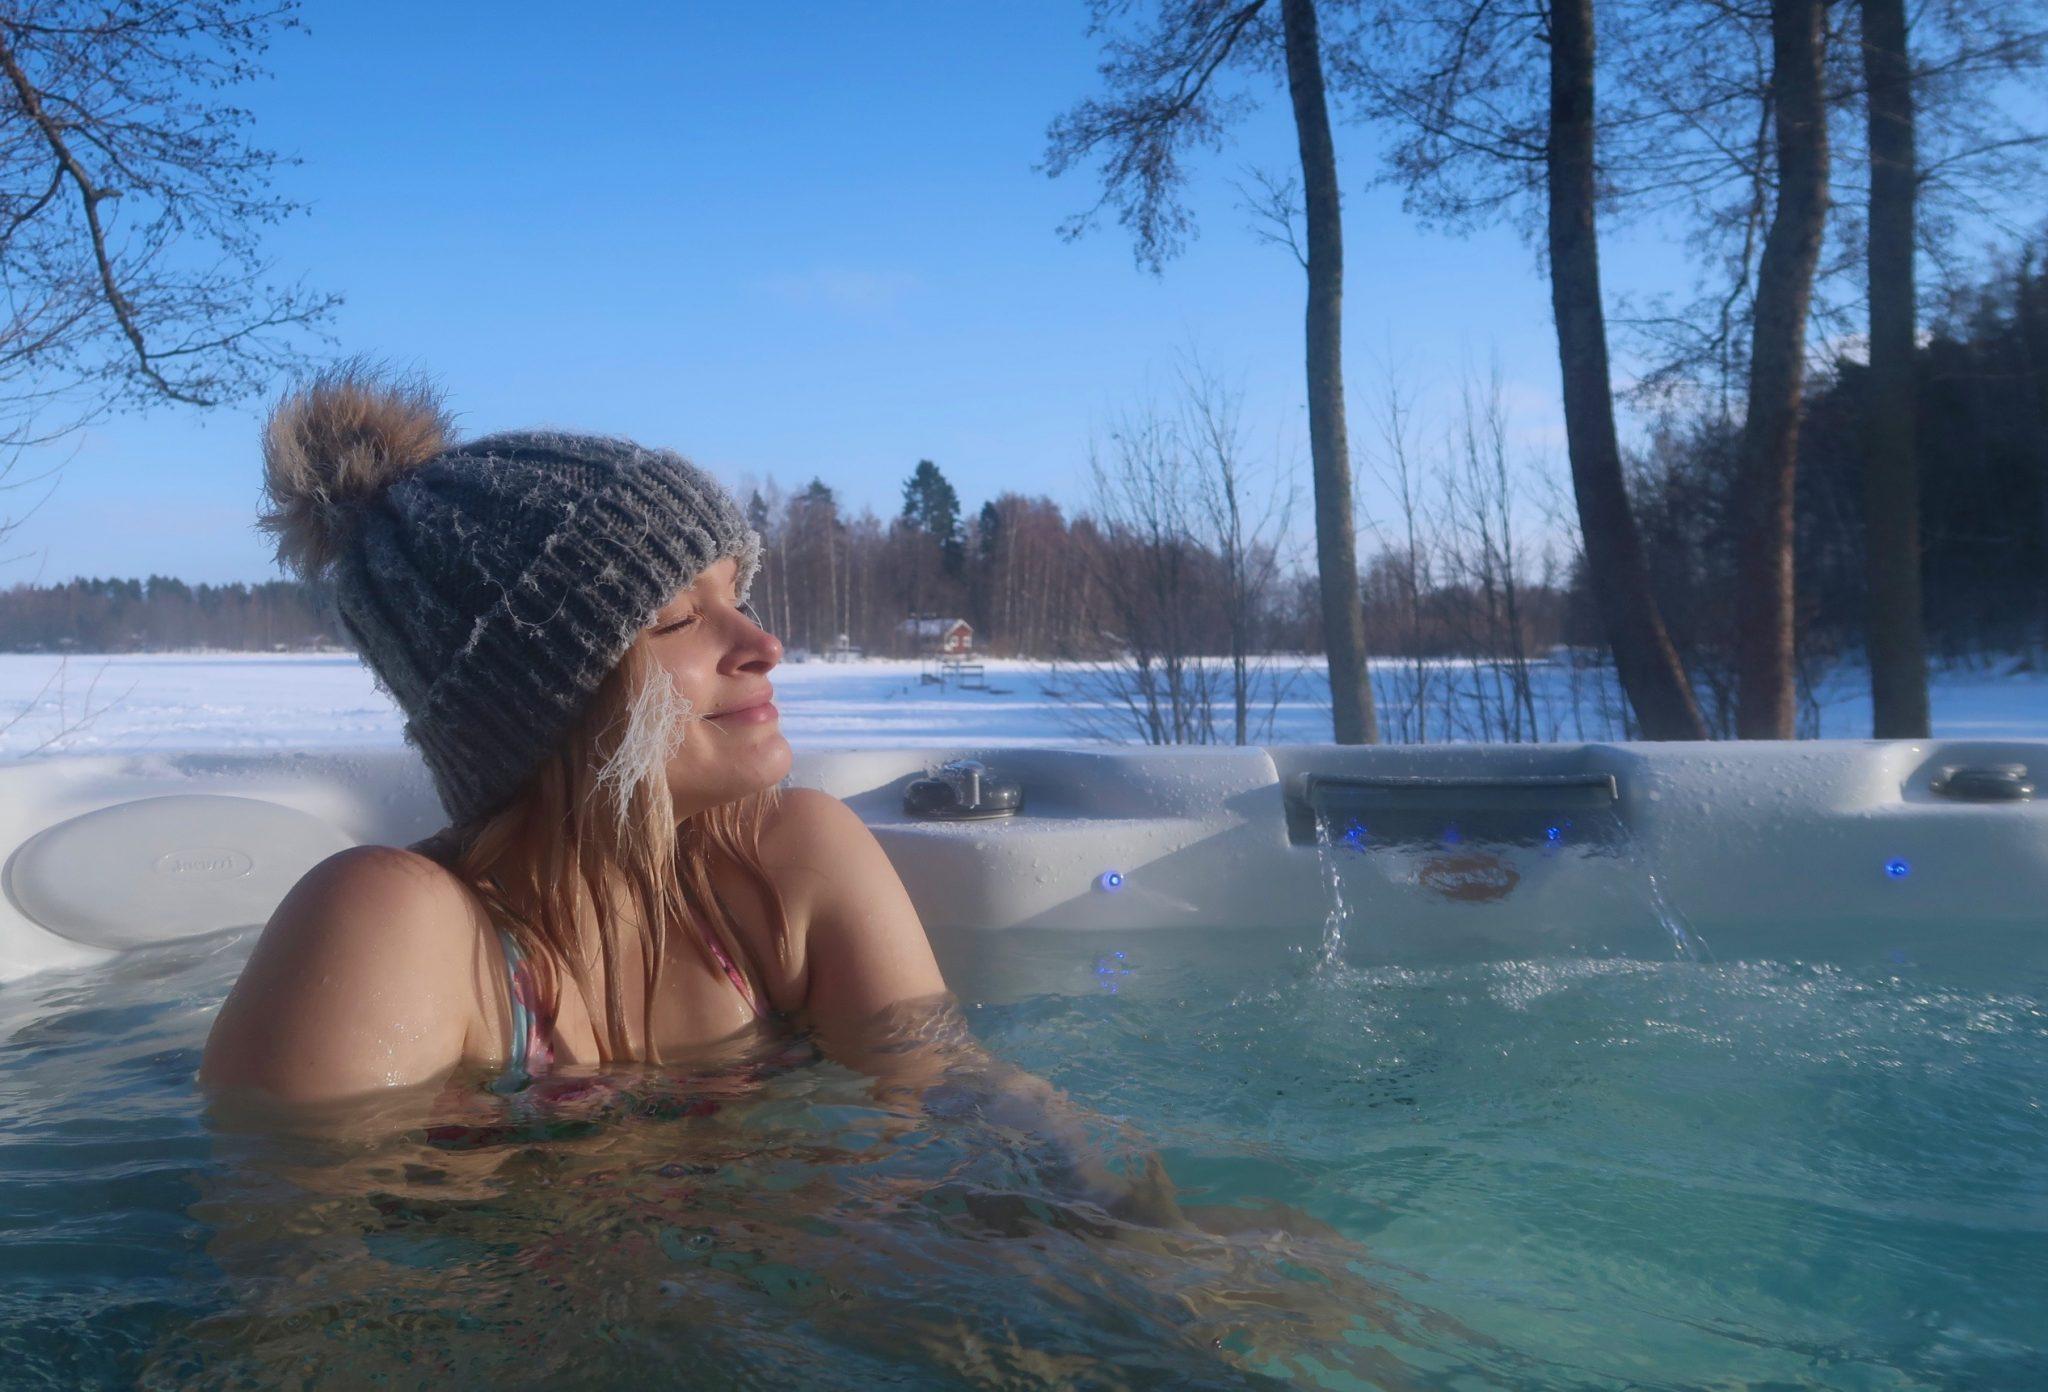 Petäys Resort jacuzzi